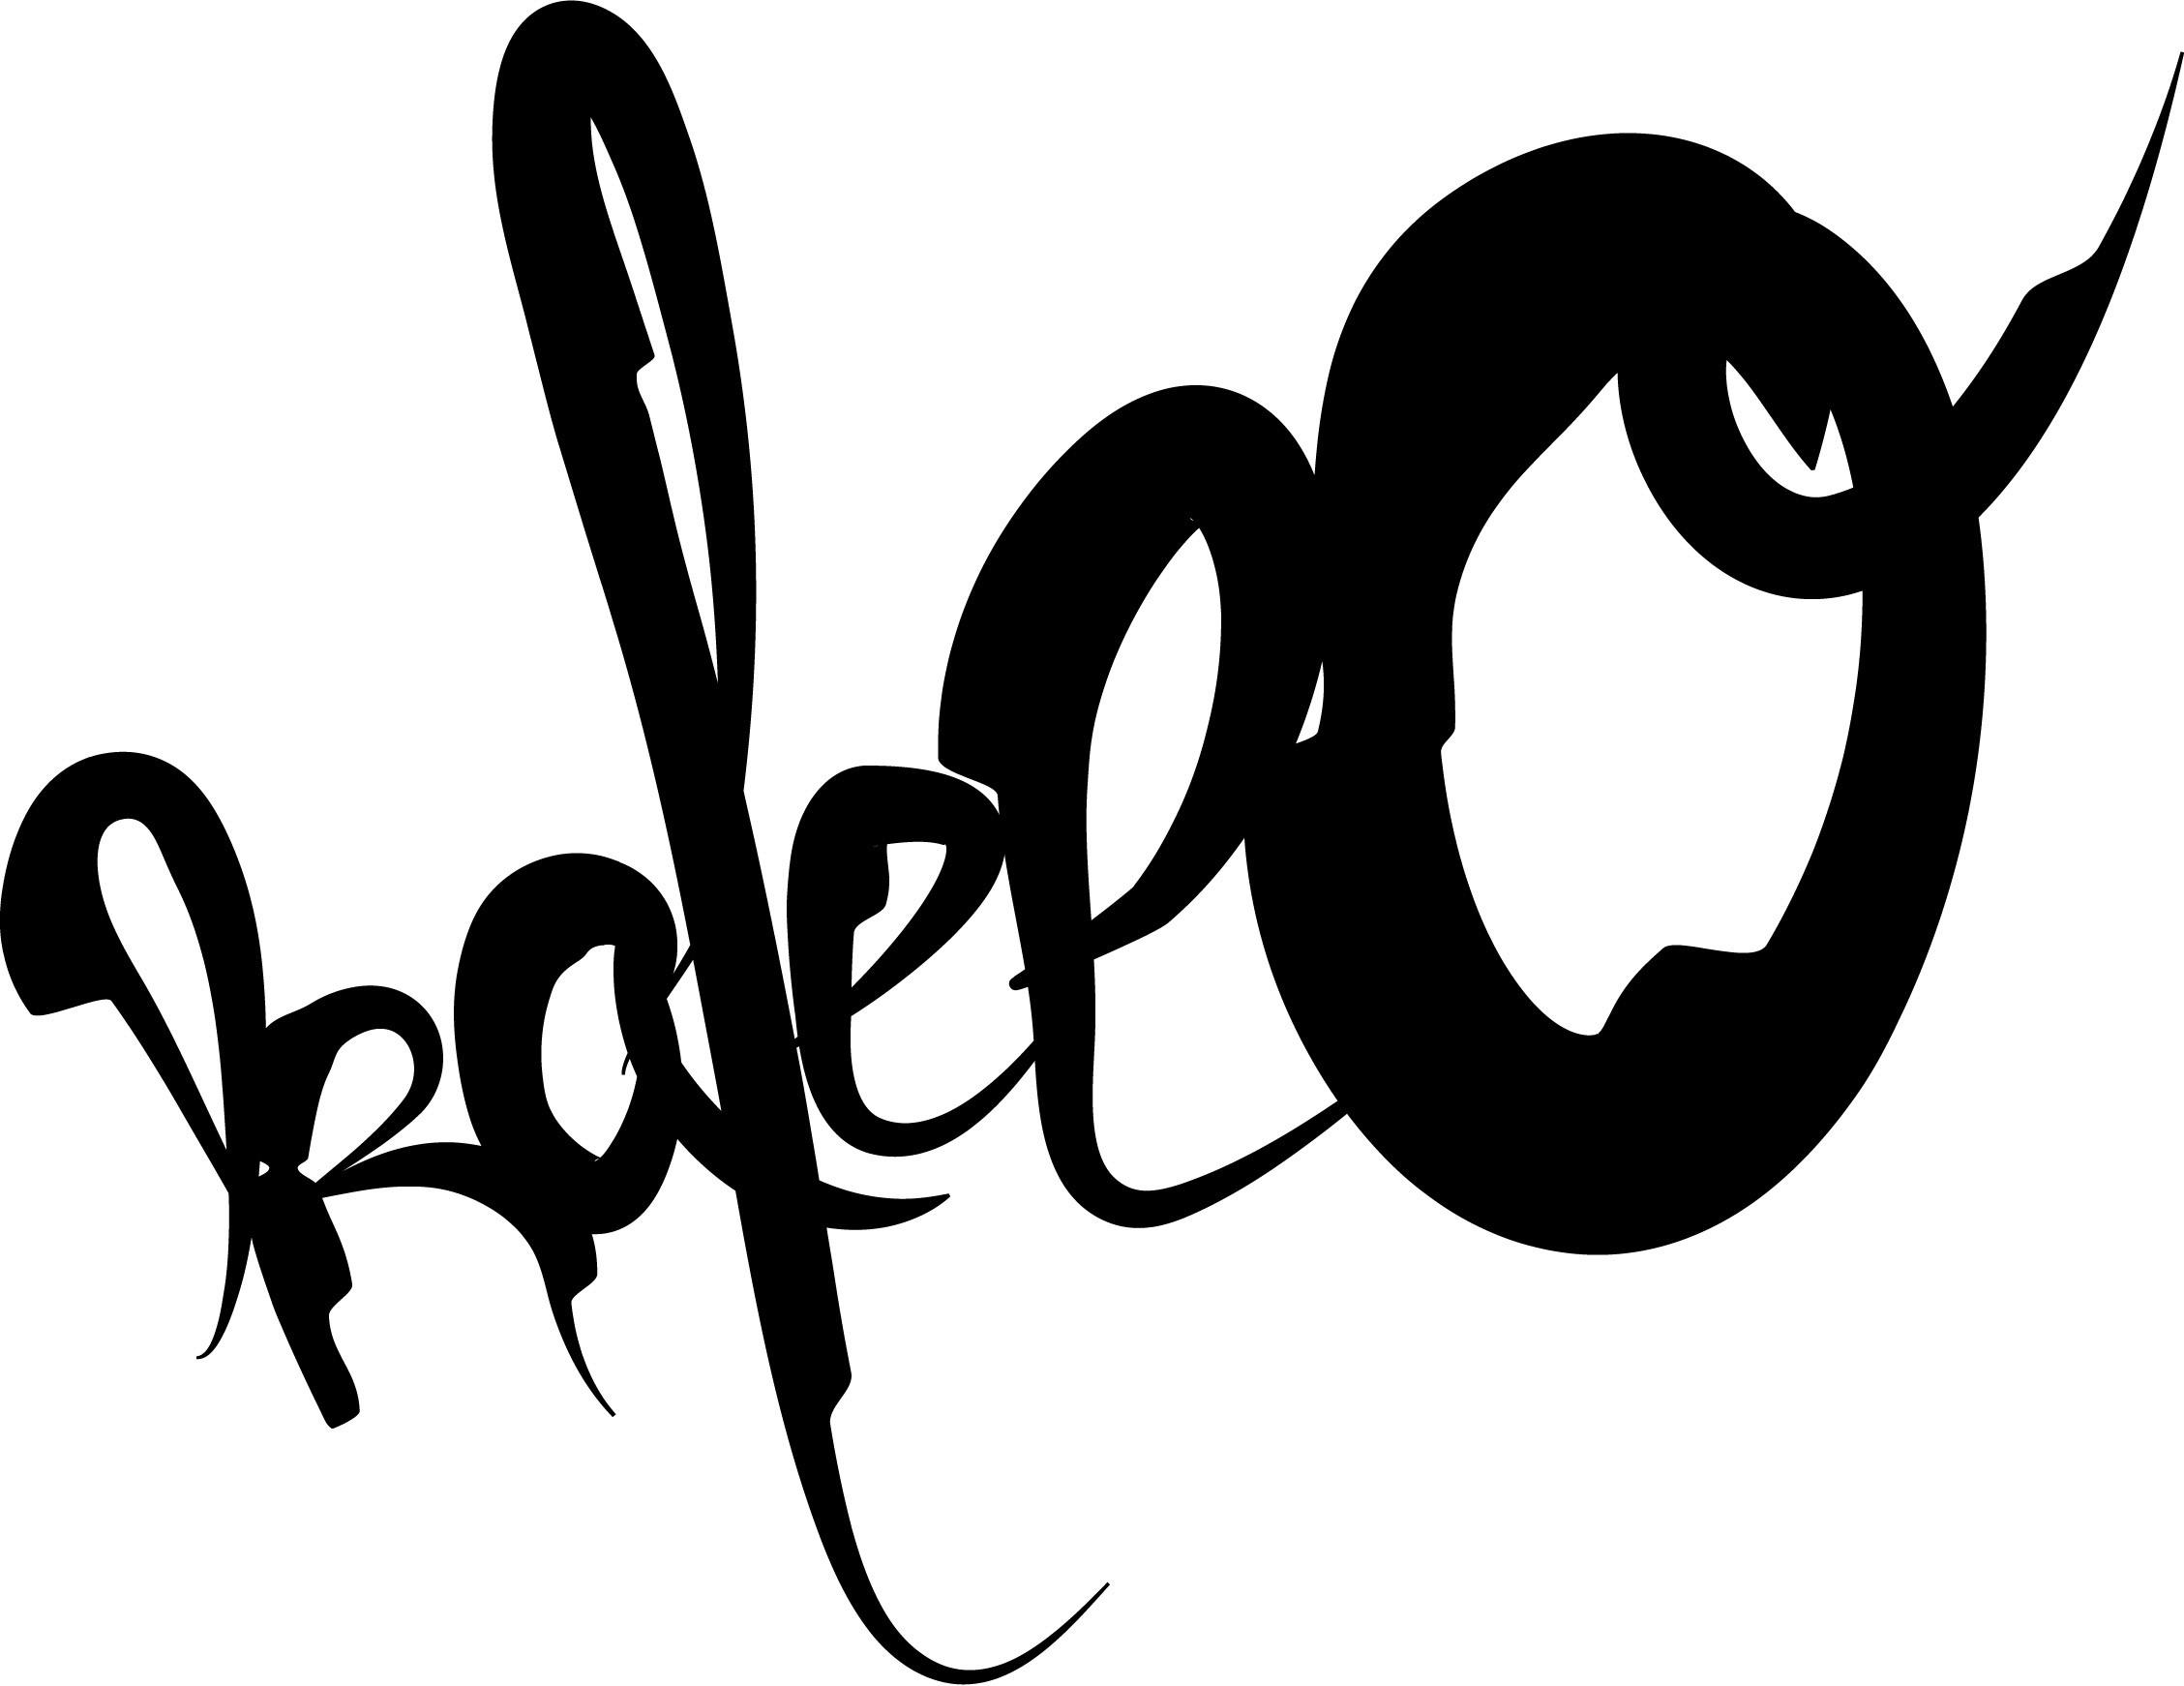 Kaleeo